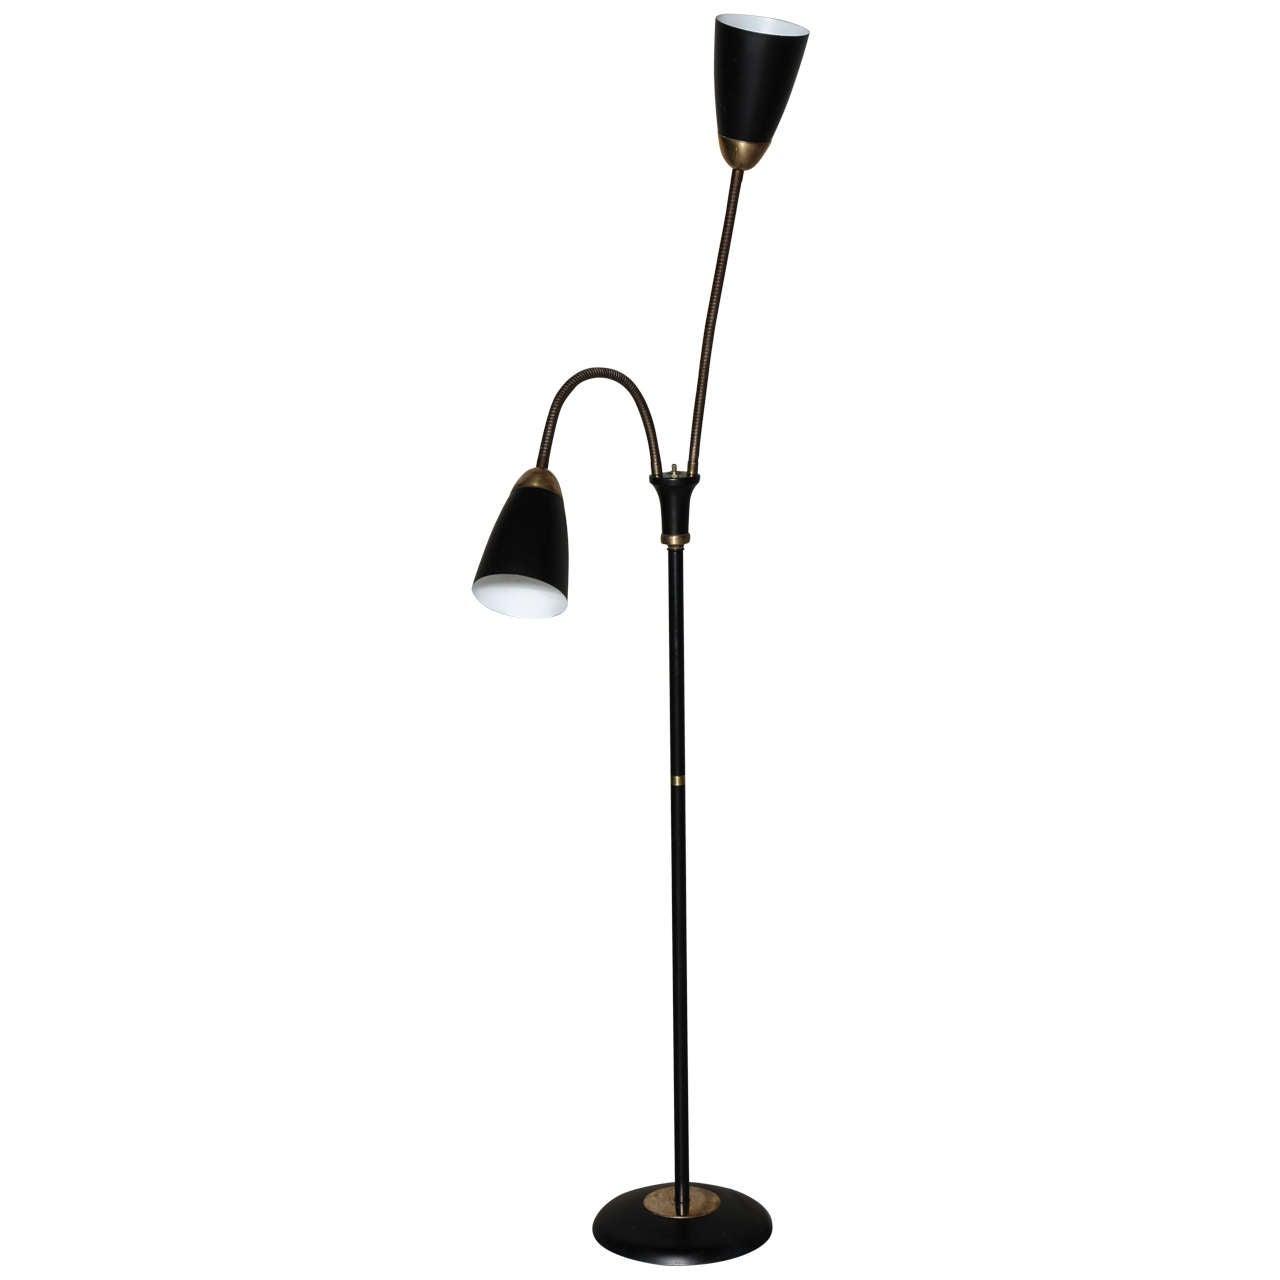 Mid century double gooseneck floor lamp at 1stdibs for 6 head gooseneck floor lamp